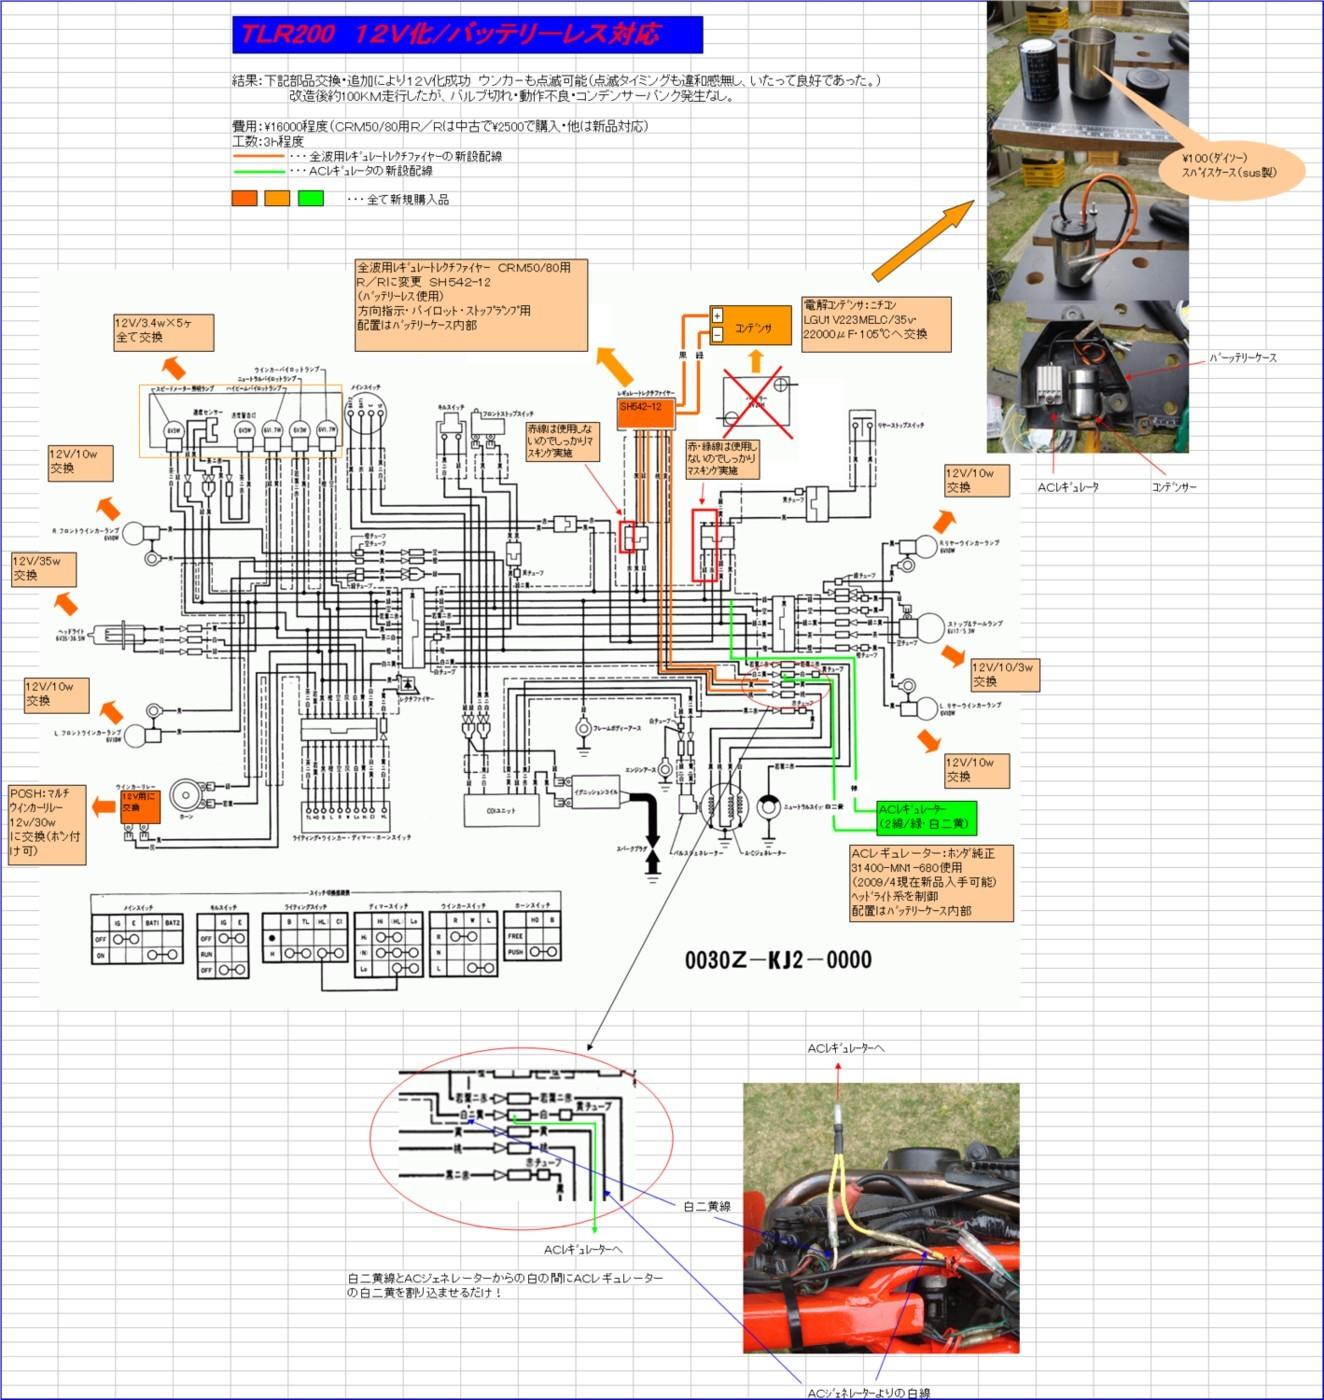 TLR12v・バッテリーレス対応配線図改訂版5